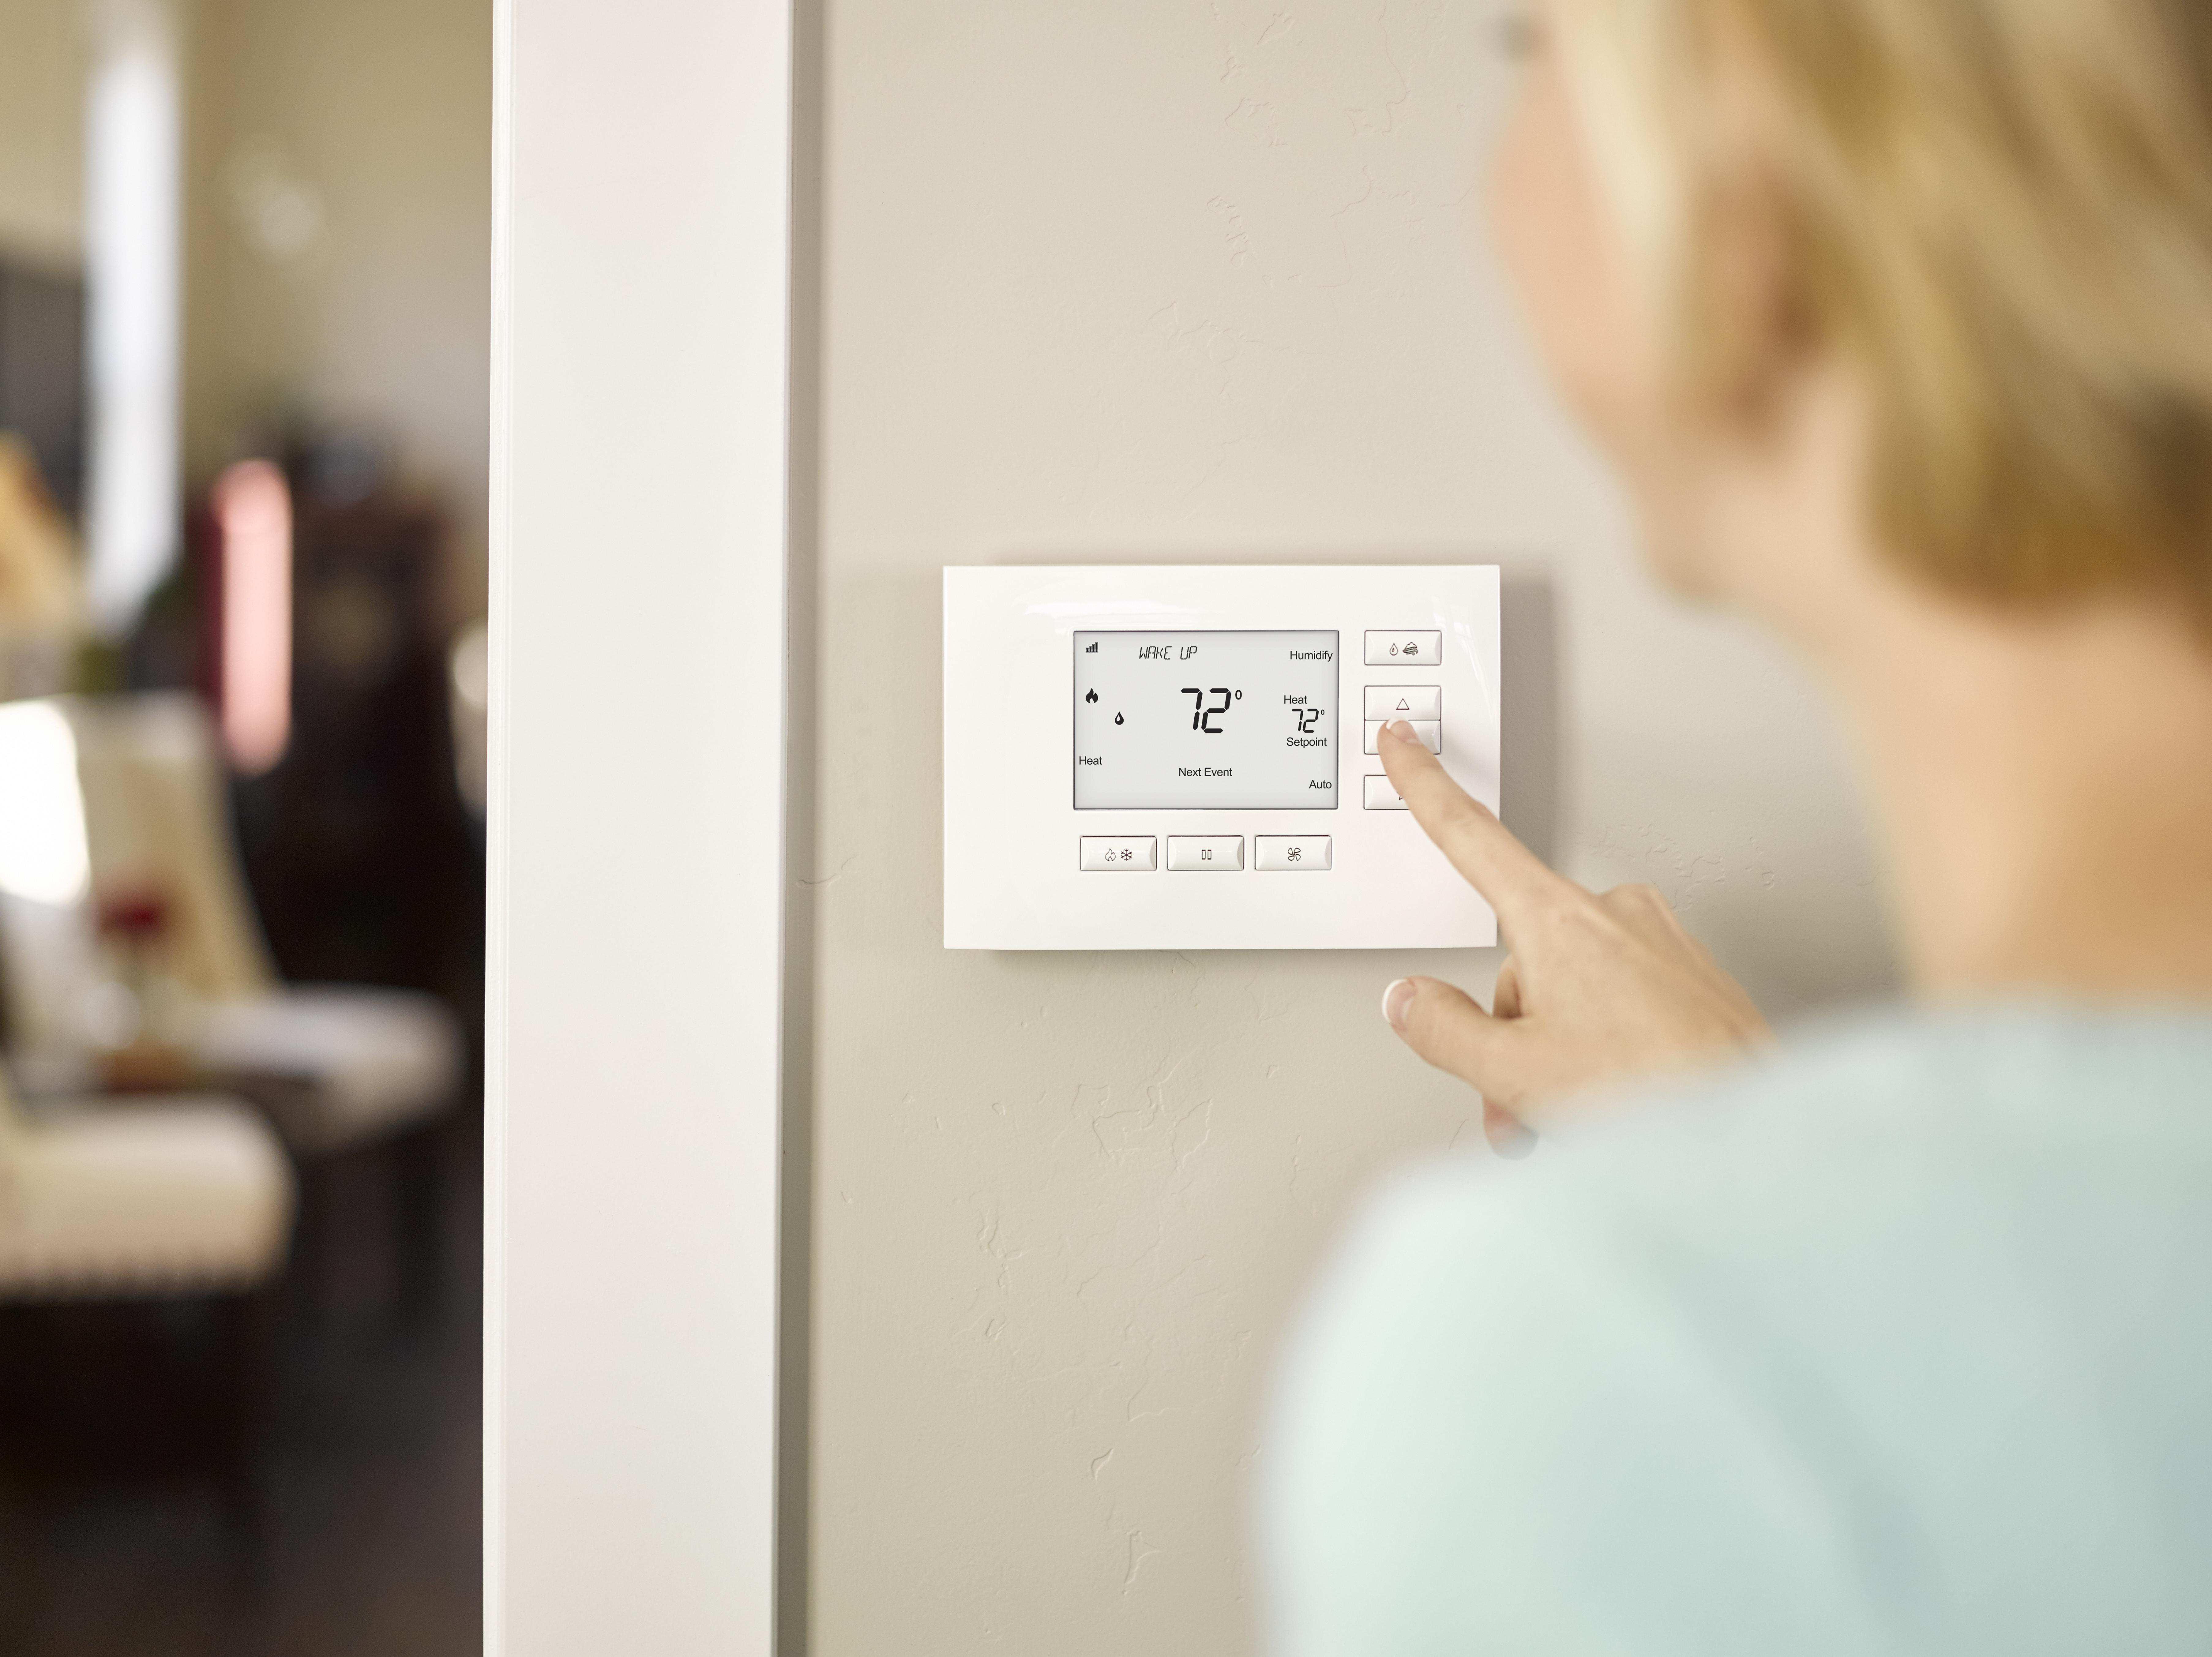 Smart Thermostat Installer in Houston